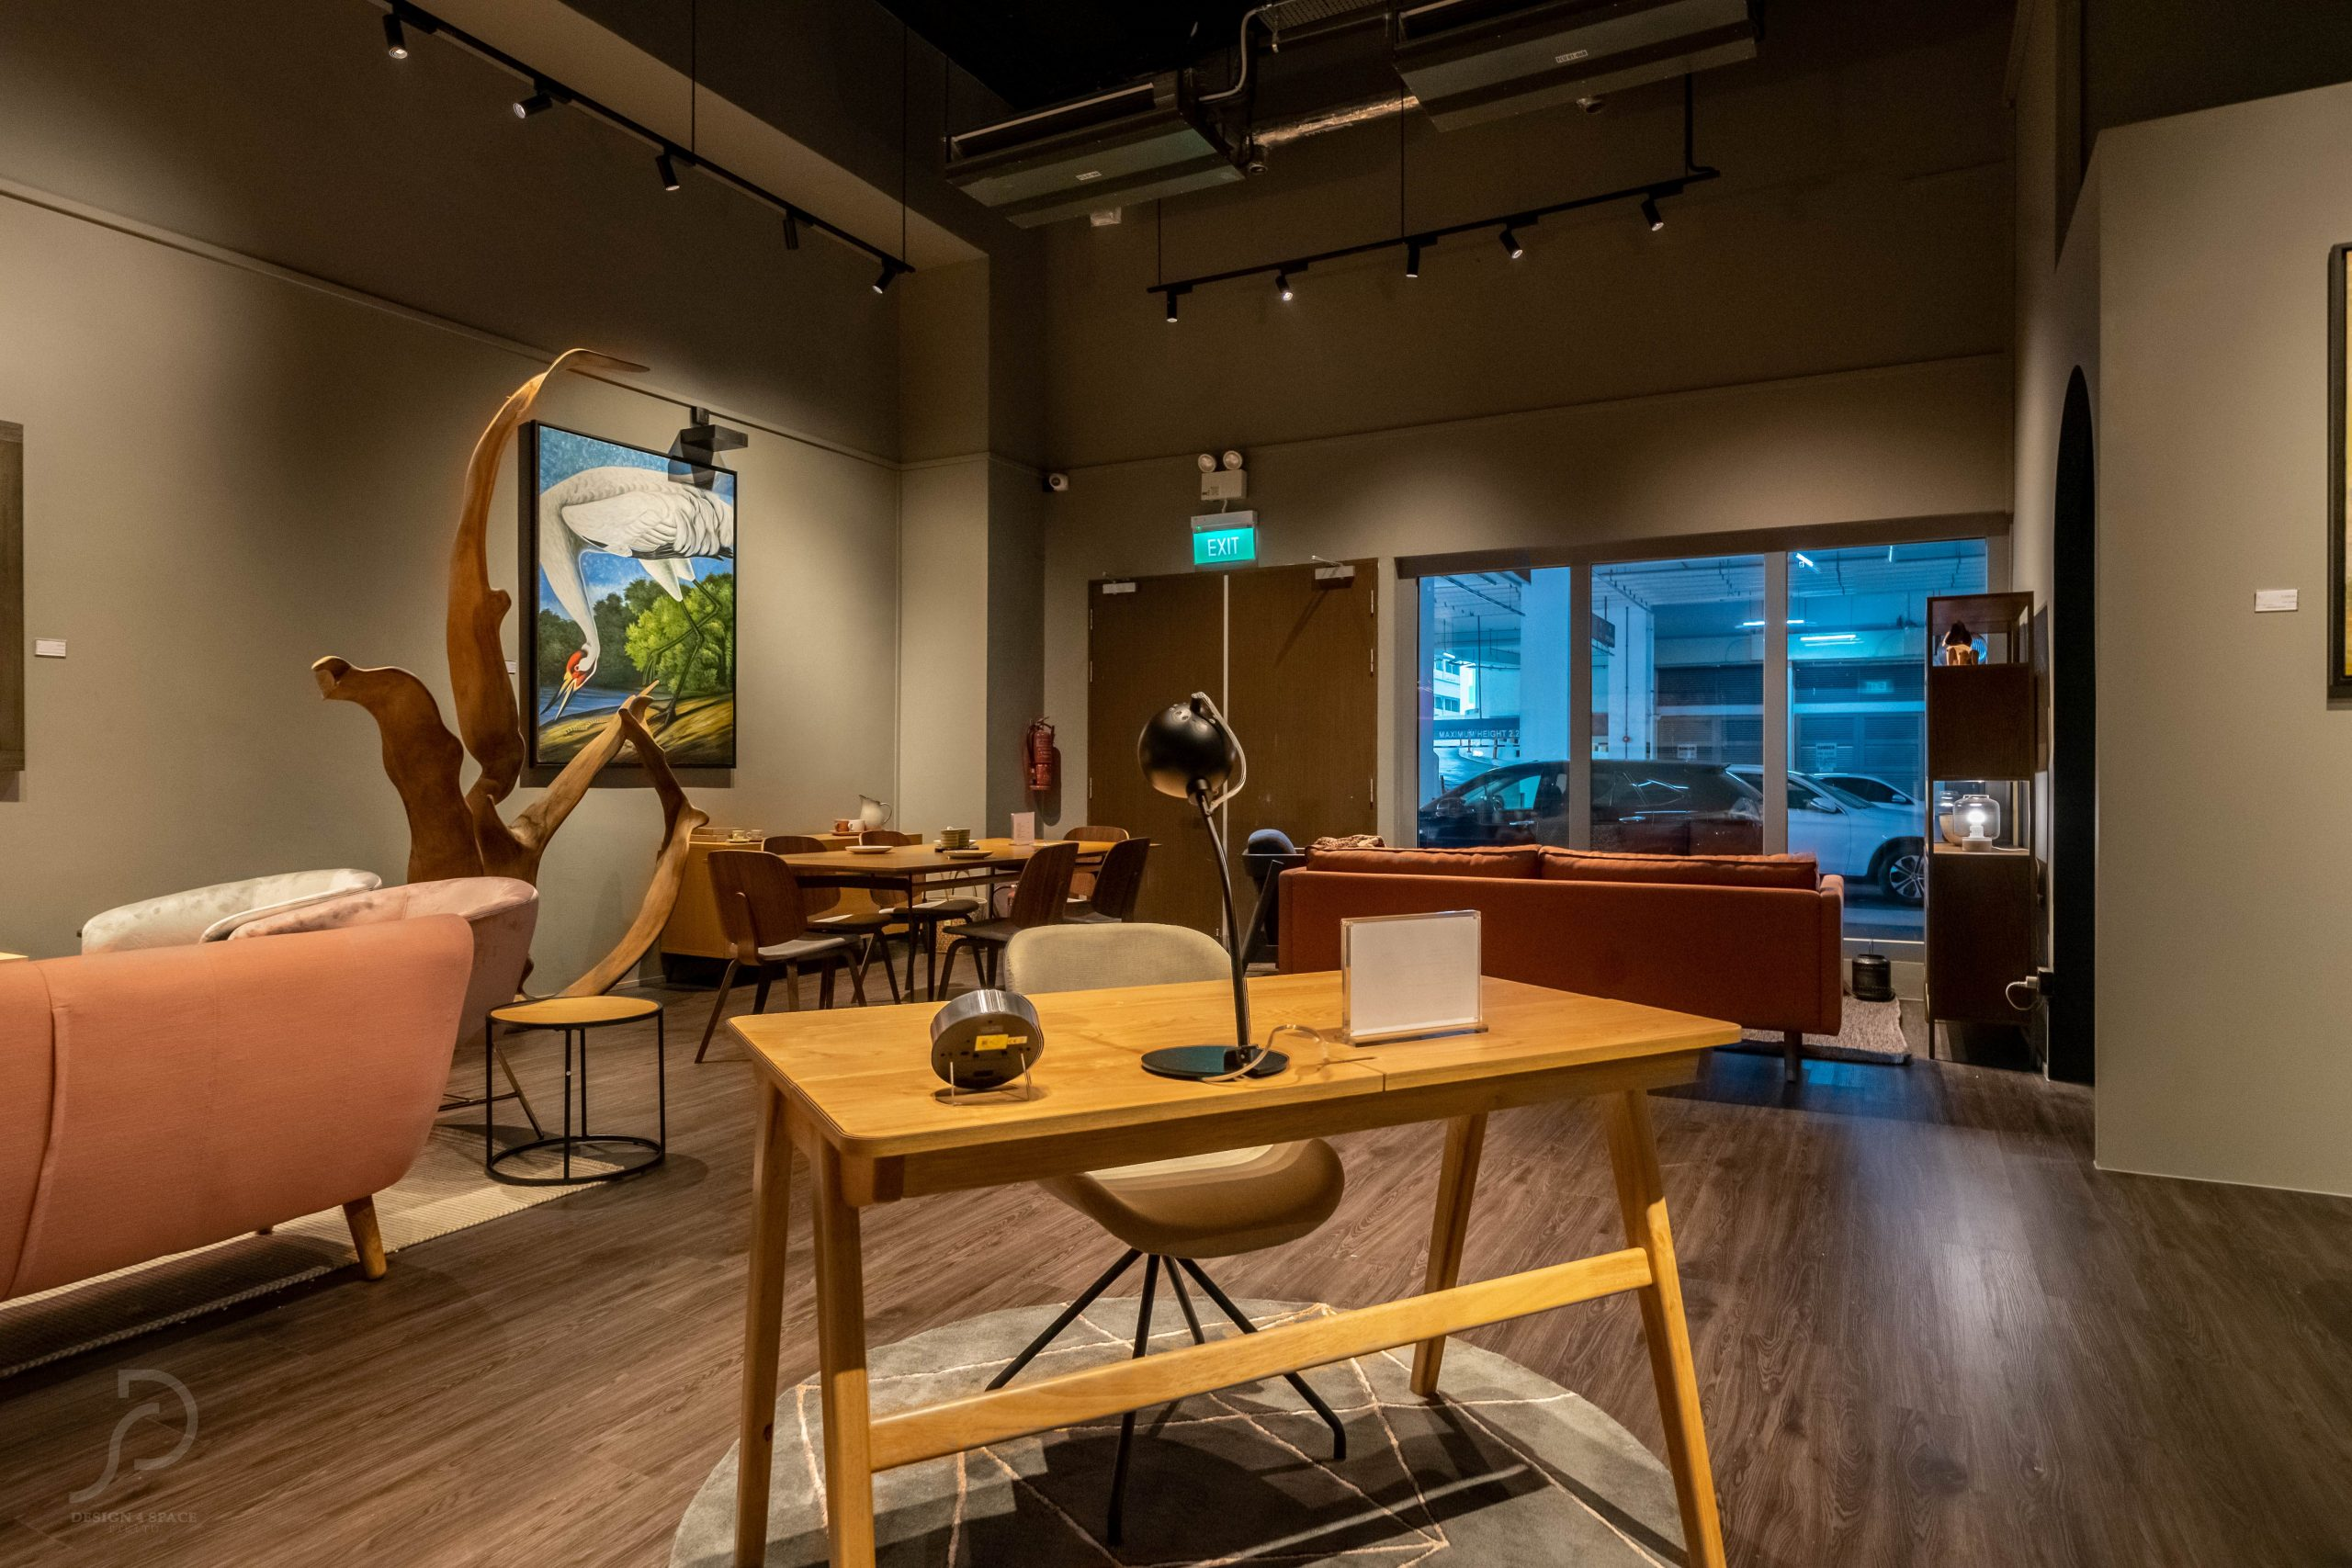 Furniture boutique51